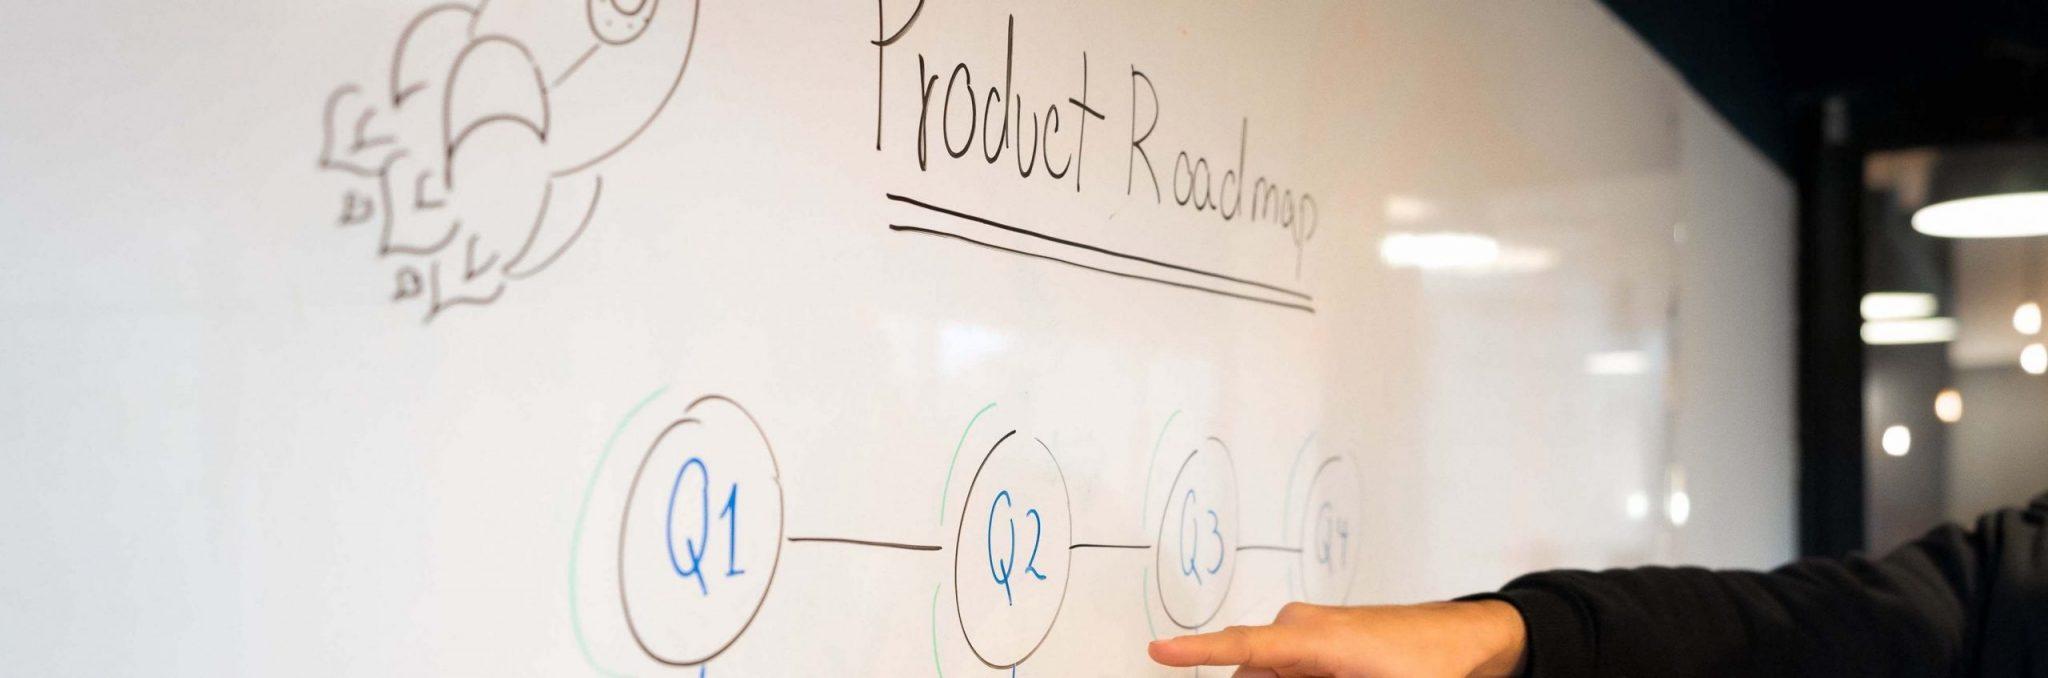 4 product roadmap templates